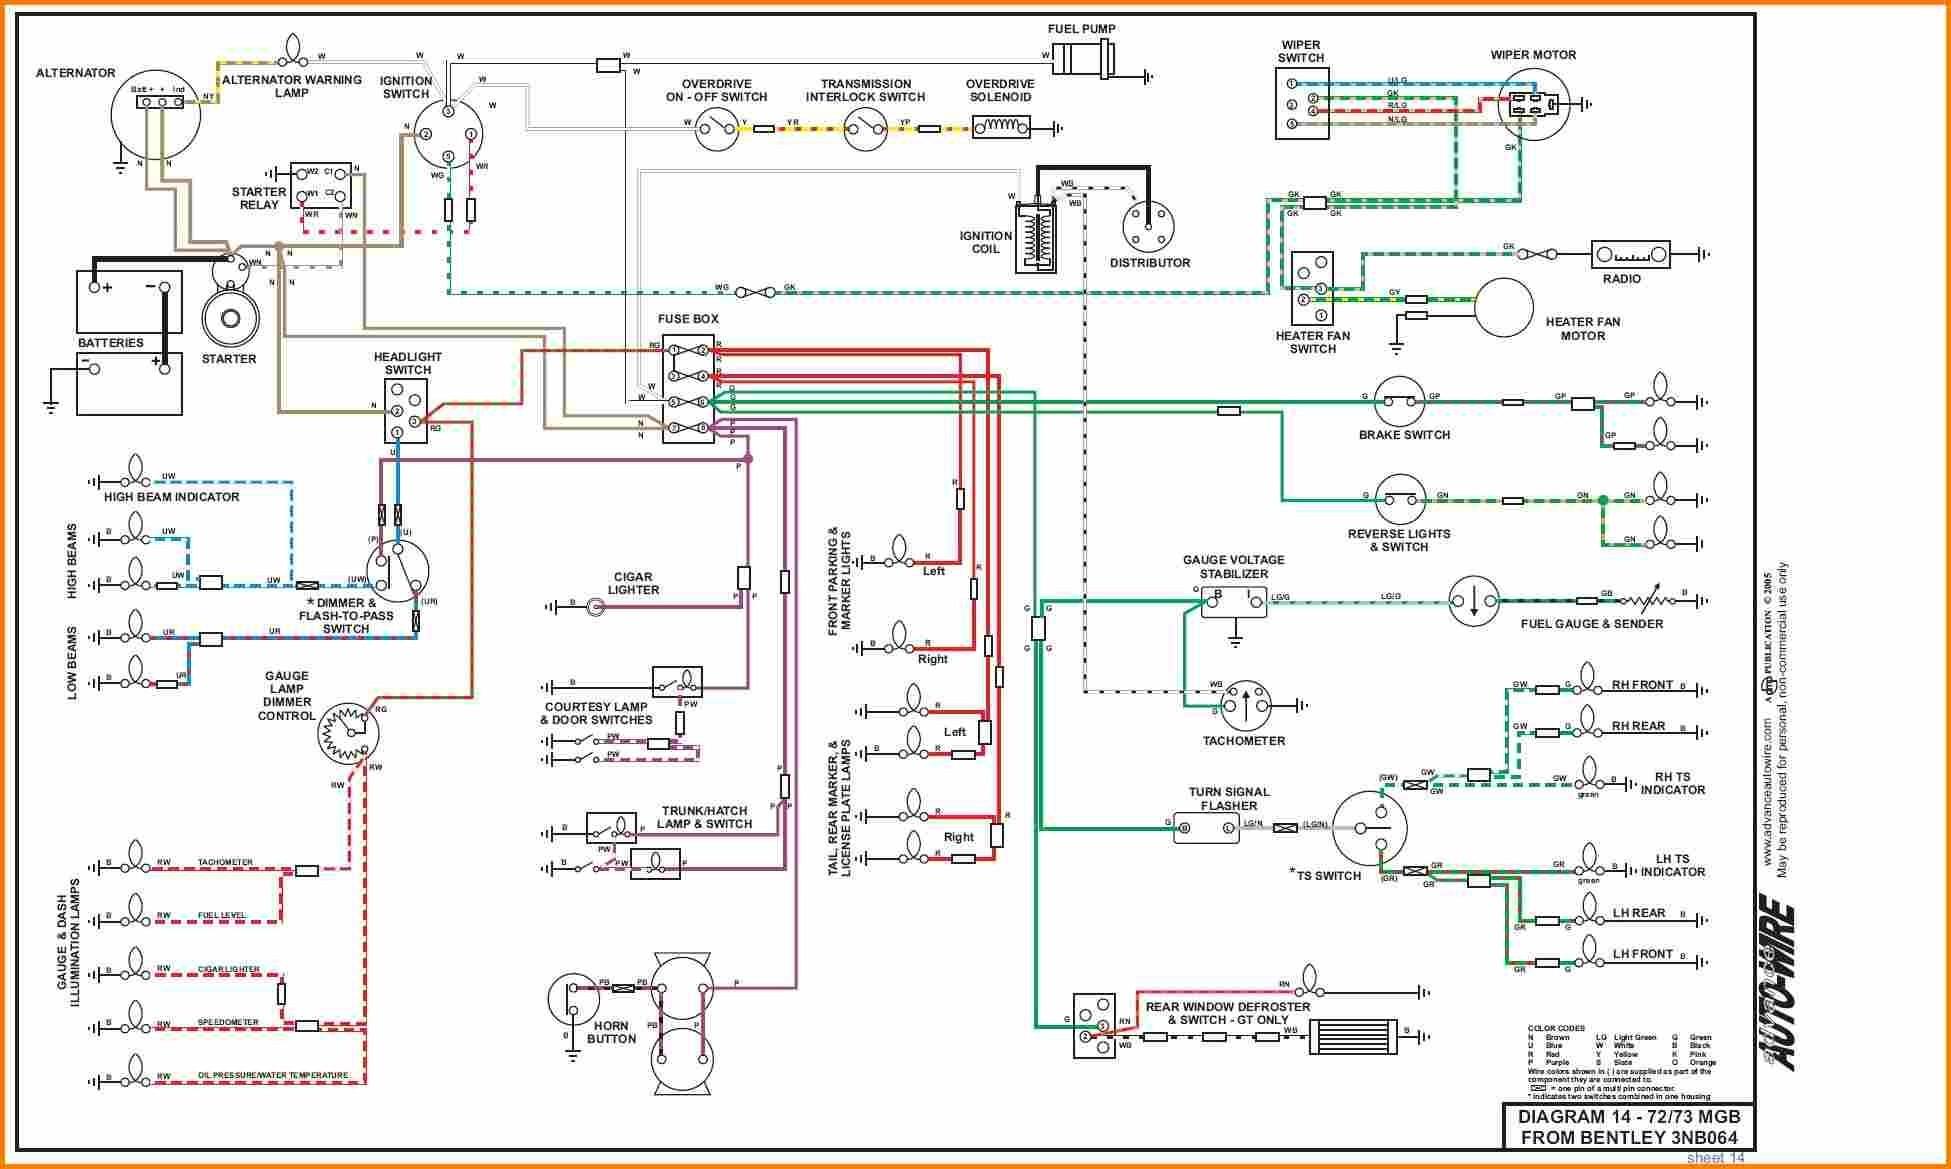 1973 mg mgb wiring diagram schematic bf 2826  mg midget 1500 as well as 1972 chevy camaro wiring  mg midget 1500 as well as 1972 chevy